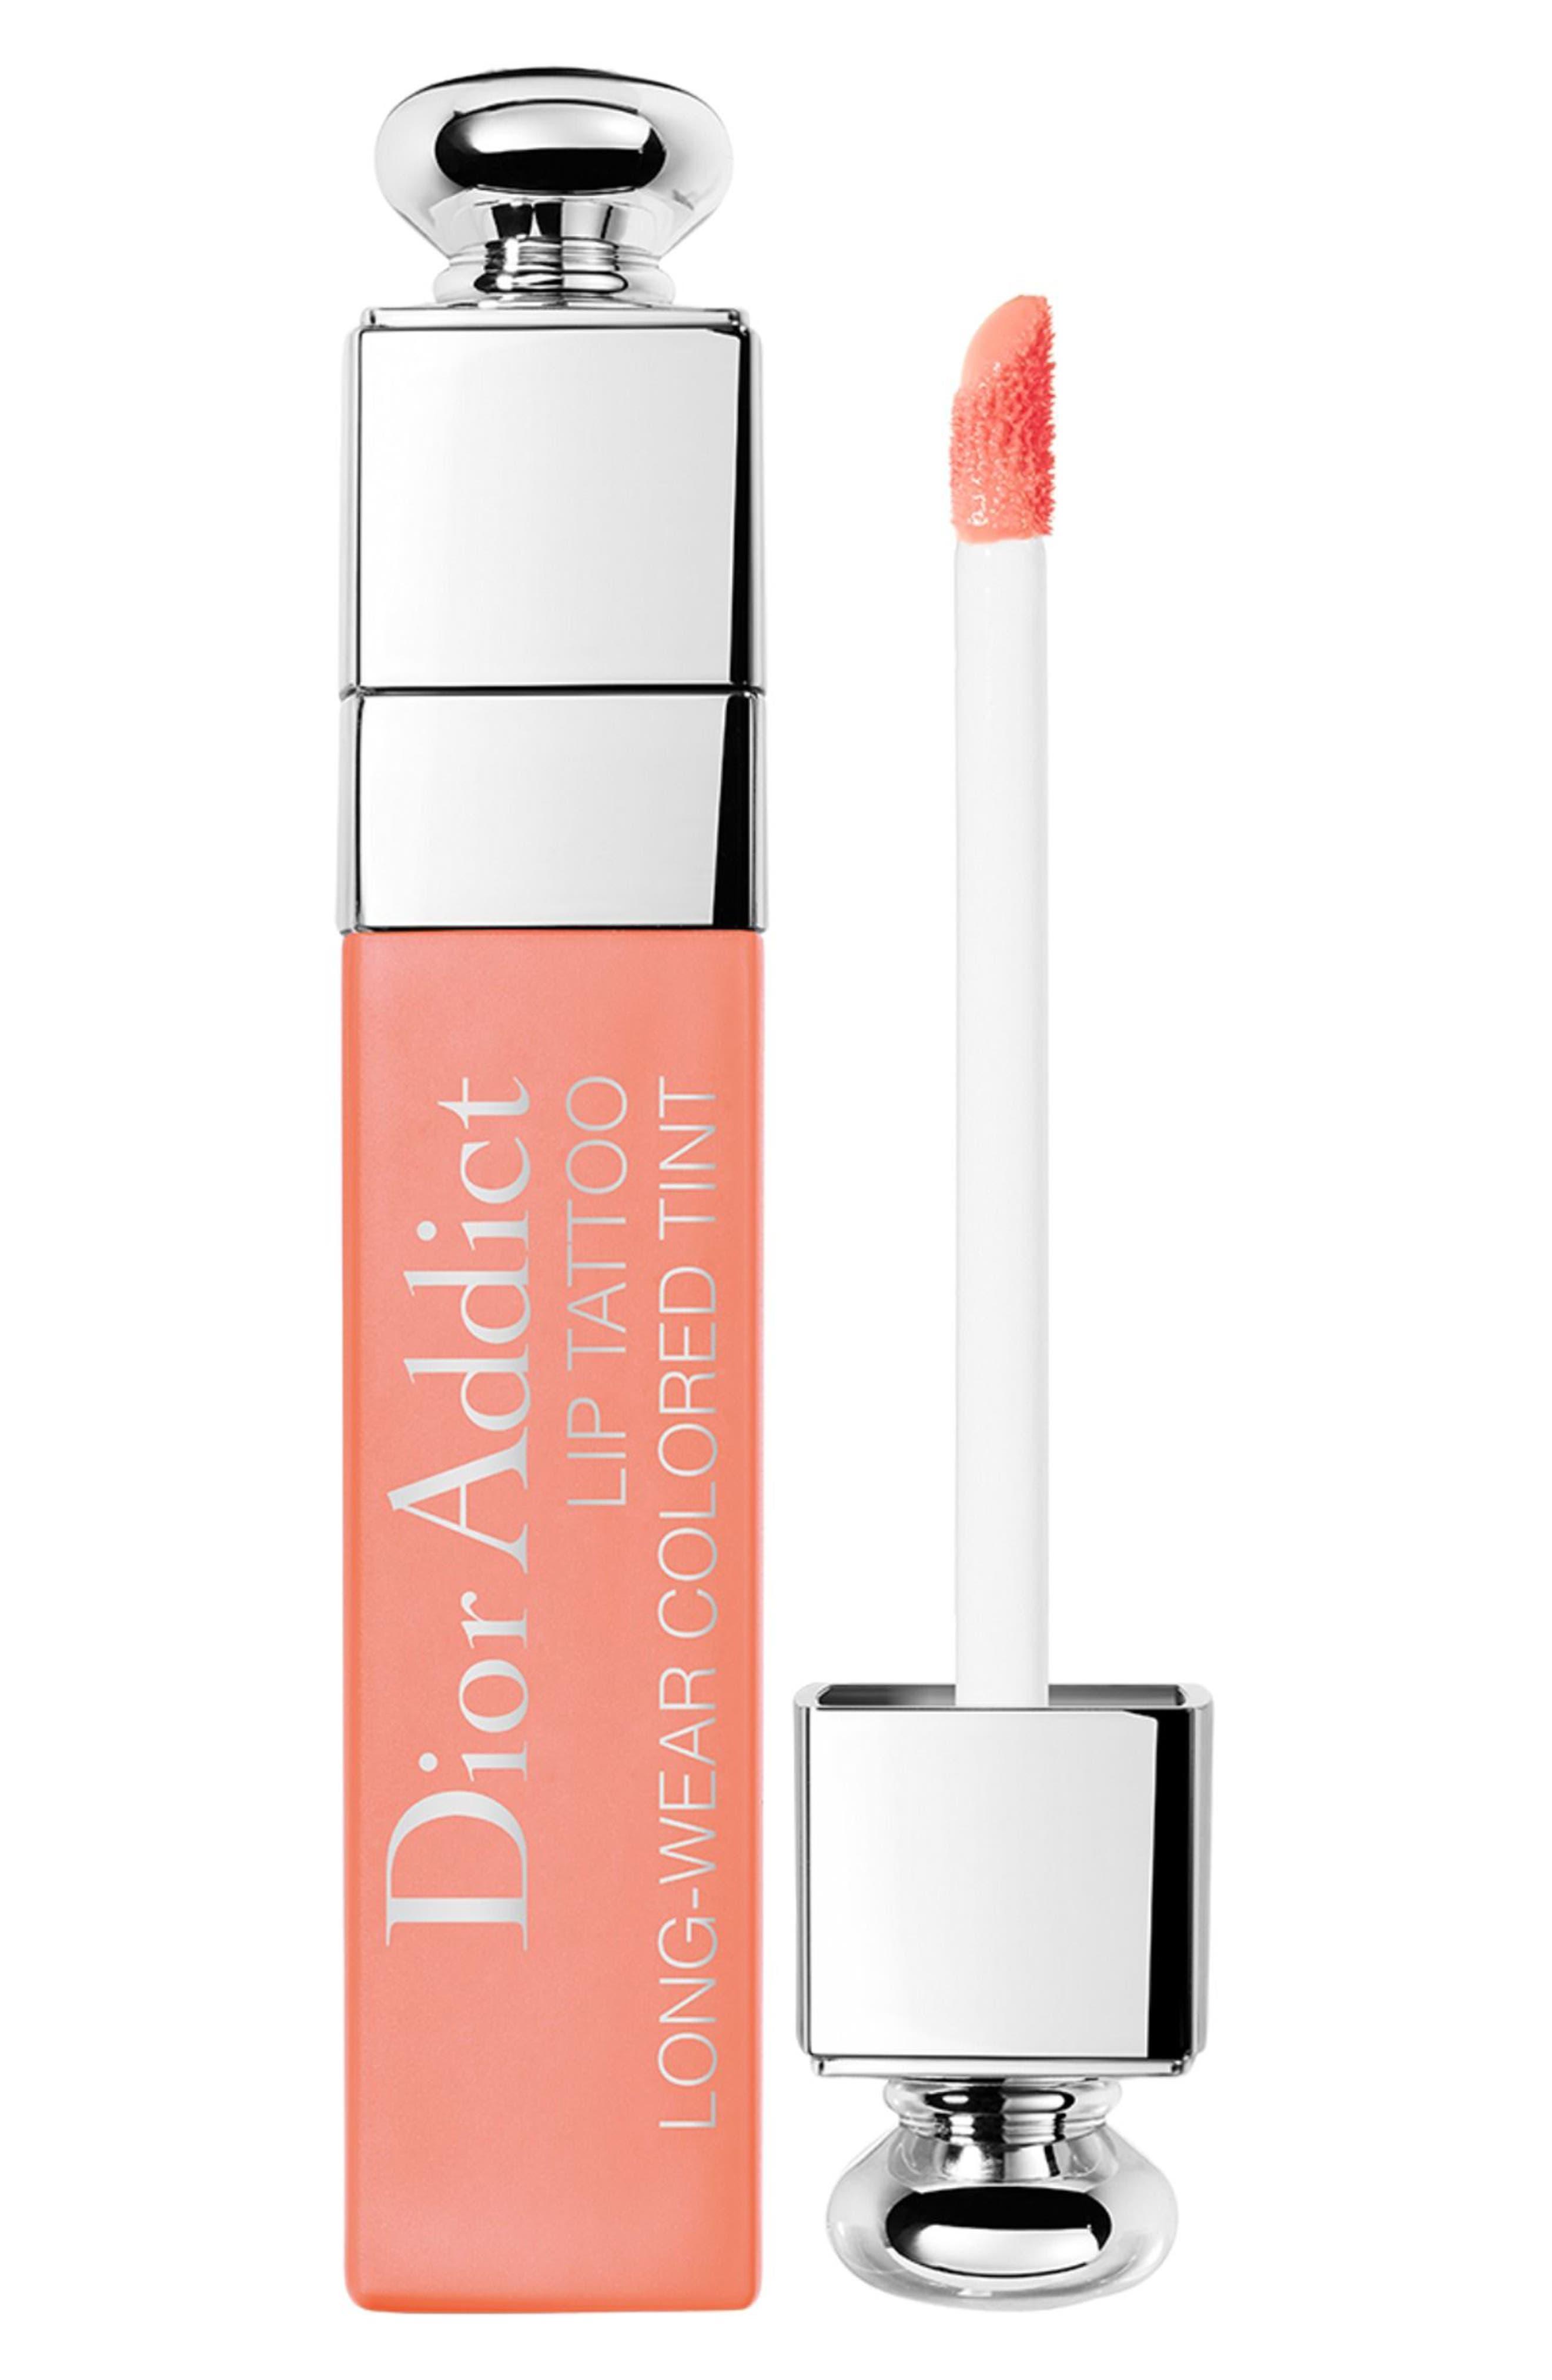 Dior Addict Lip Tattoo Color Juice Long-Wearing Color Tint - 341 Litchi